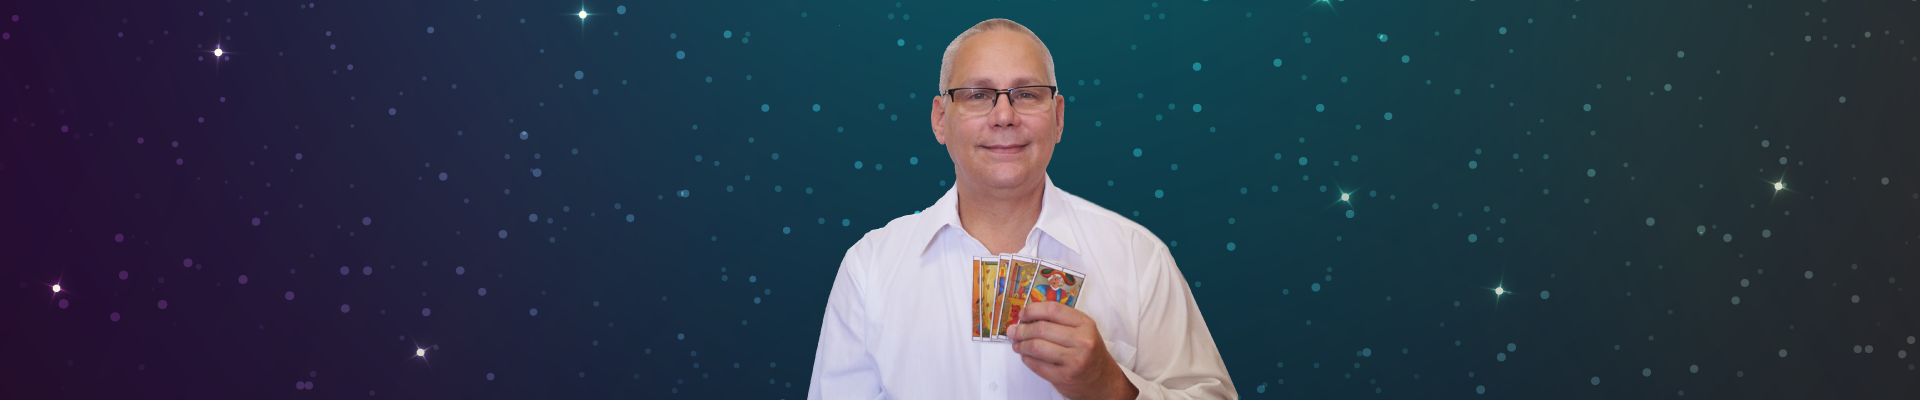 2️⃣0️⃣2️⃣0️⃣ AGOSTO PISCIS Zodiaco Mensual Horóscopo de Ricardo Latouche Tarot